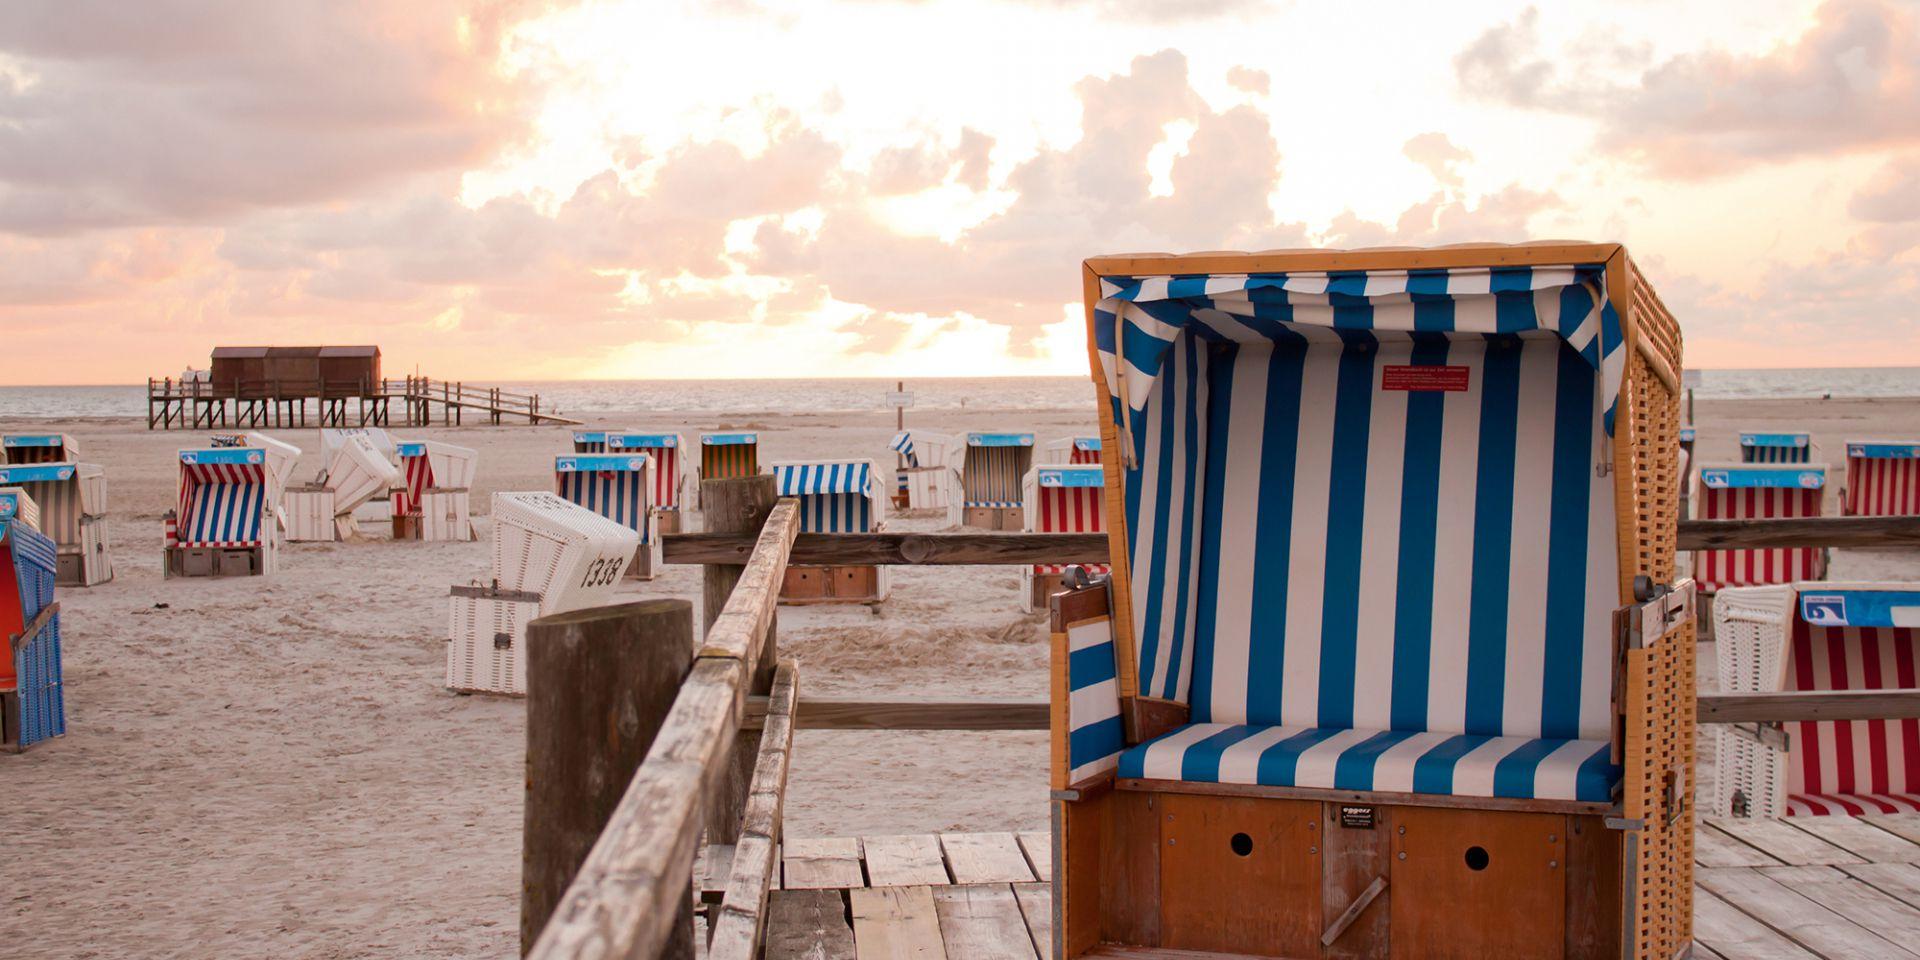 st peter ording beach motel spo strandhotel. Black Bedroom Furniture Sets. Home Design Ideas